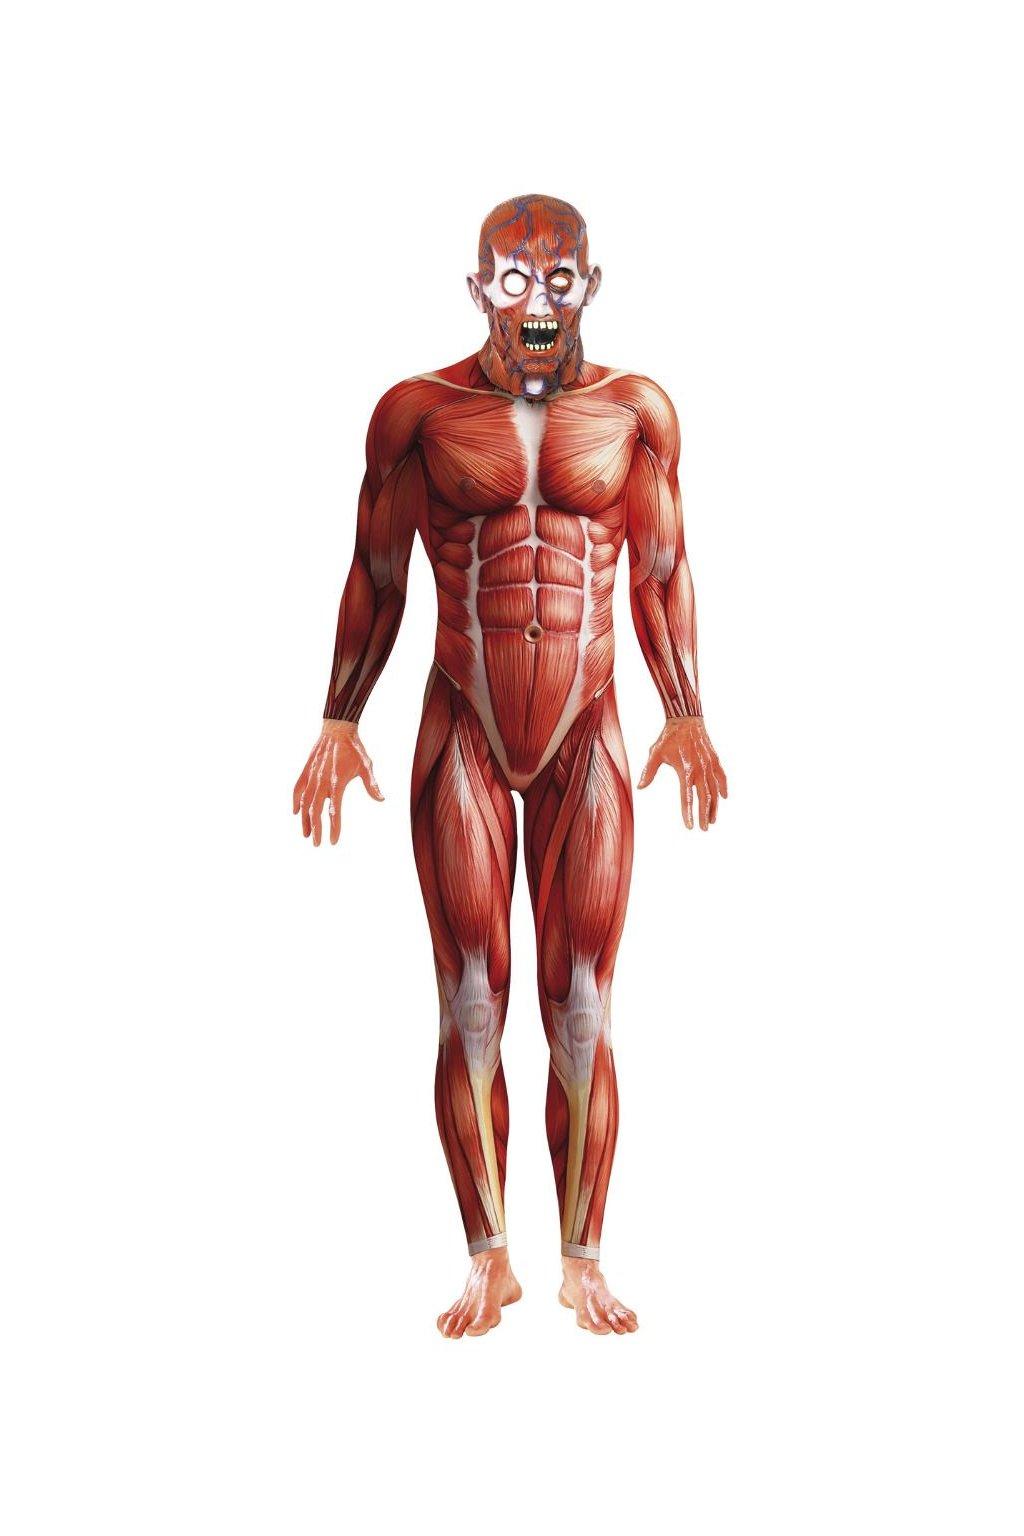 Anatomy morphsuite -  druhá kůže